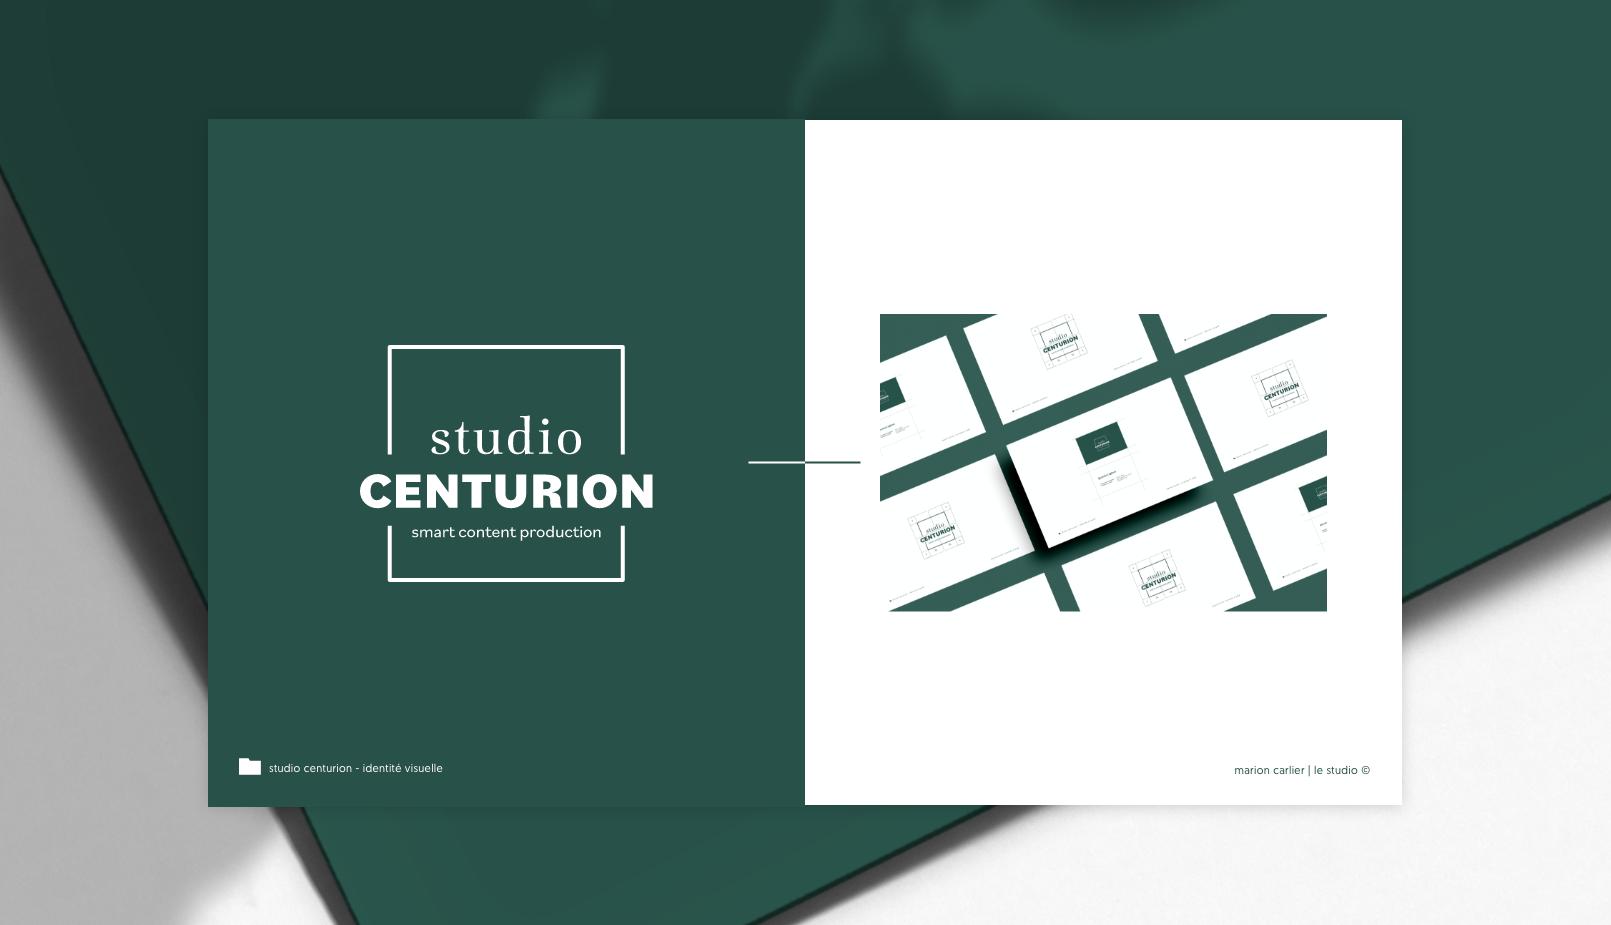 marion-carlier-services-studio-centurion